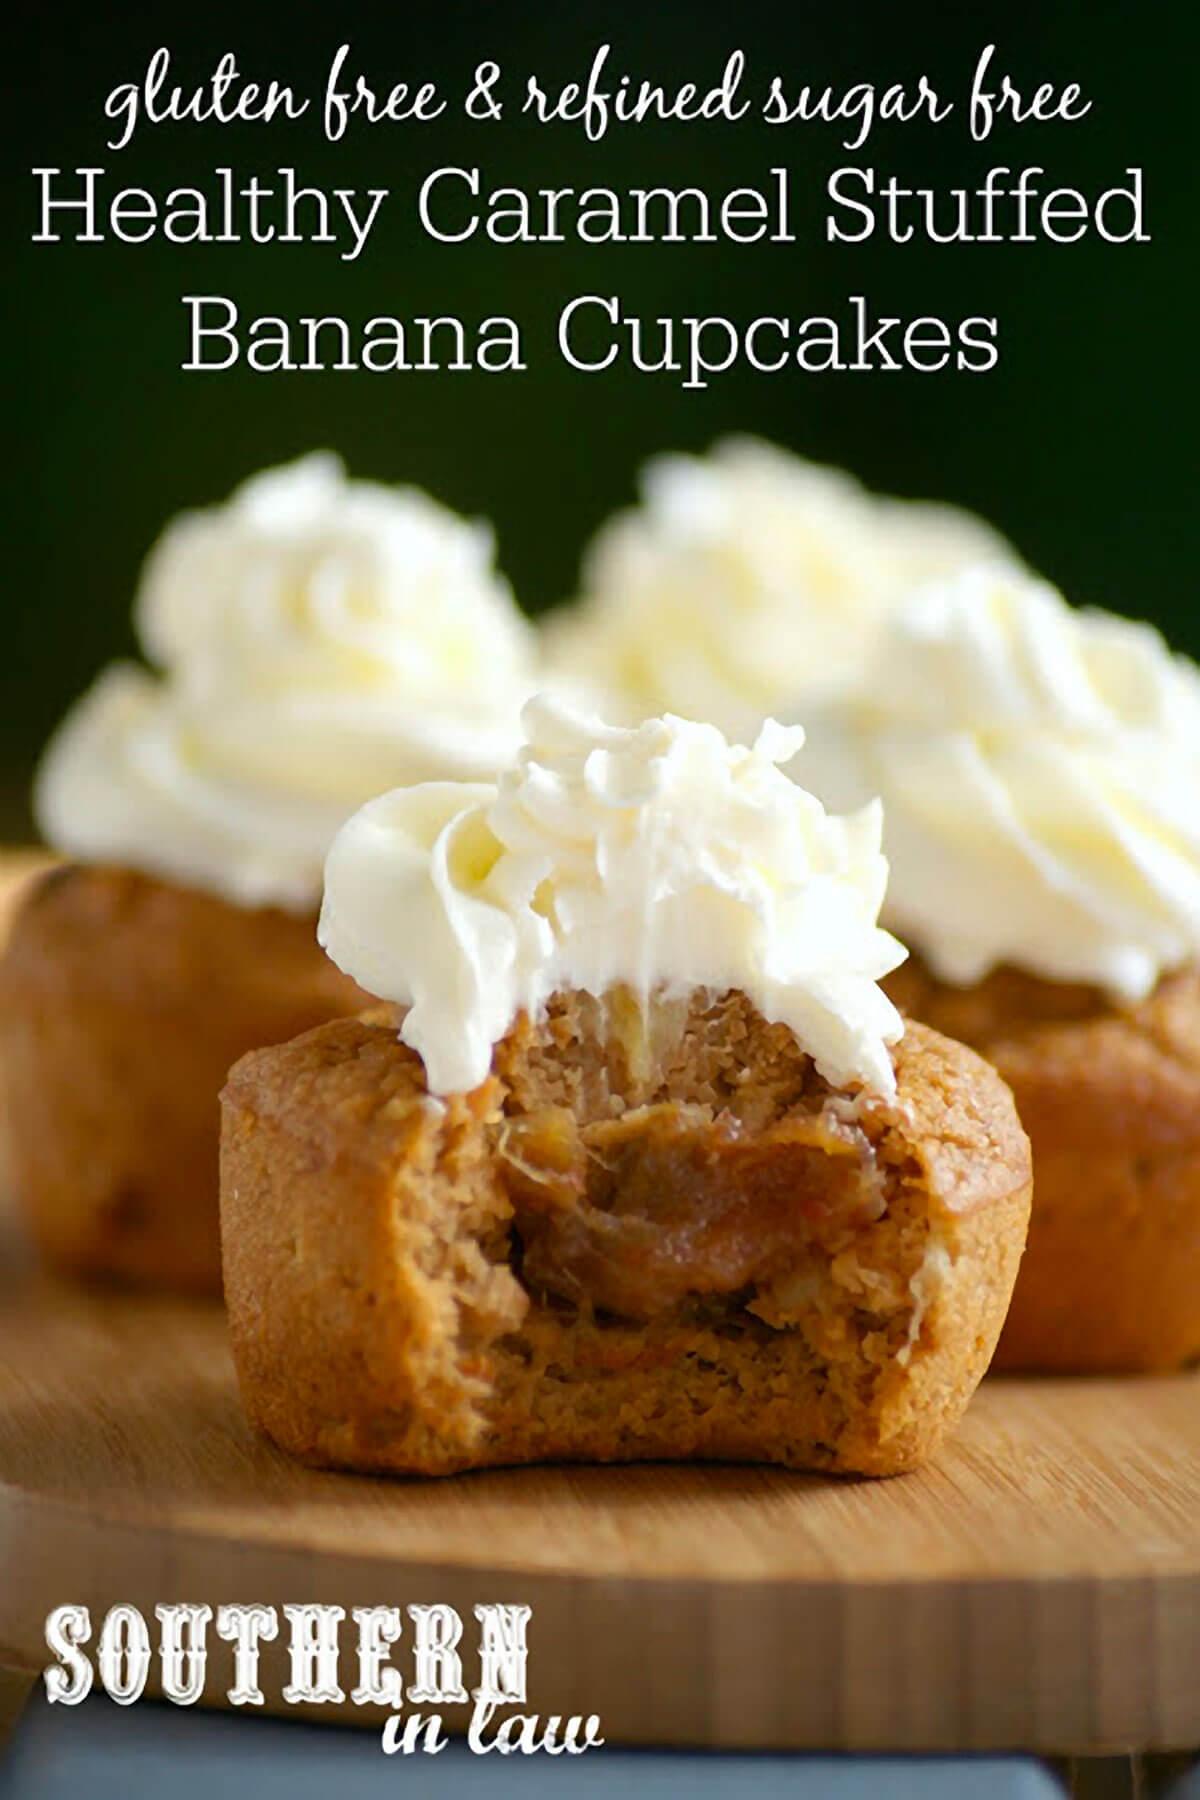 Caramel Stuffed Banana Cupcakes